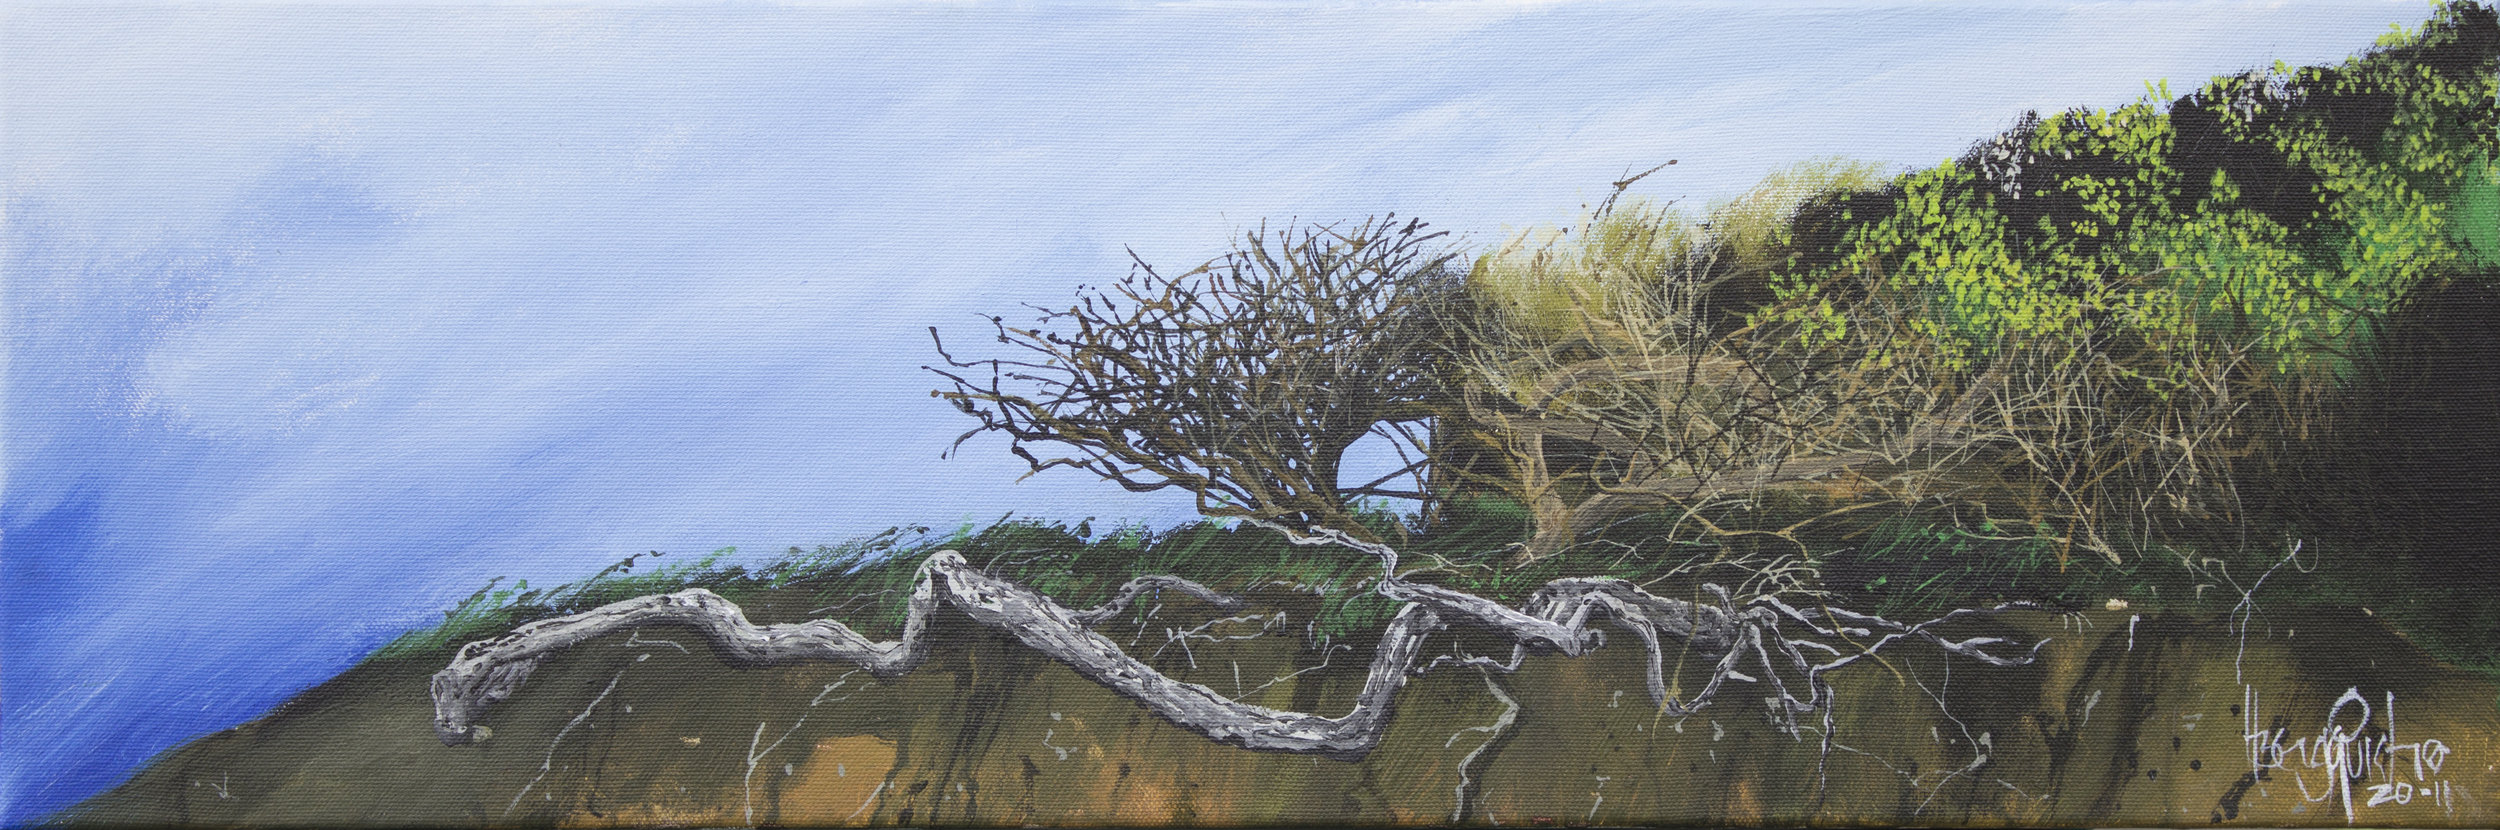 Torquay Clifftop